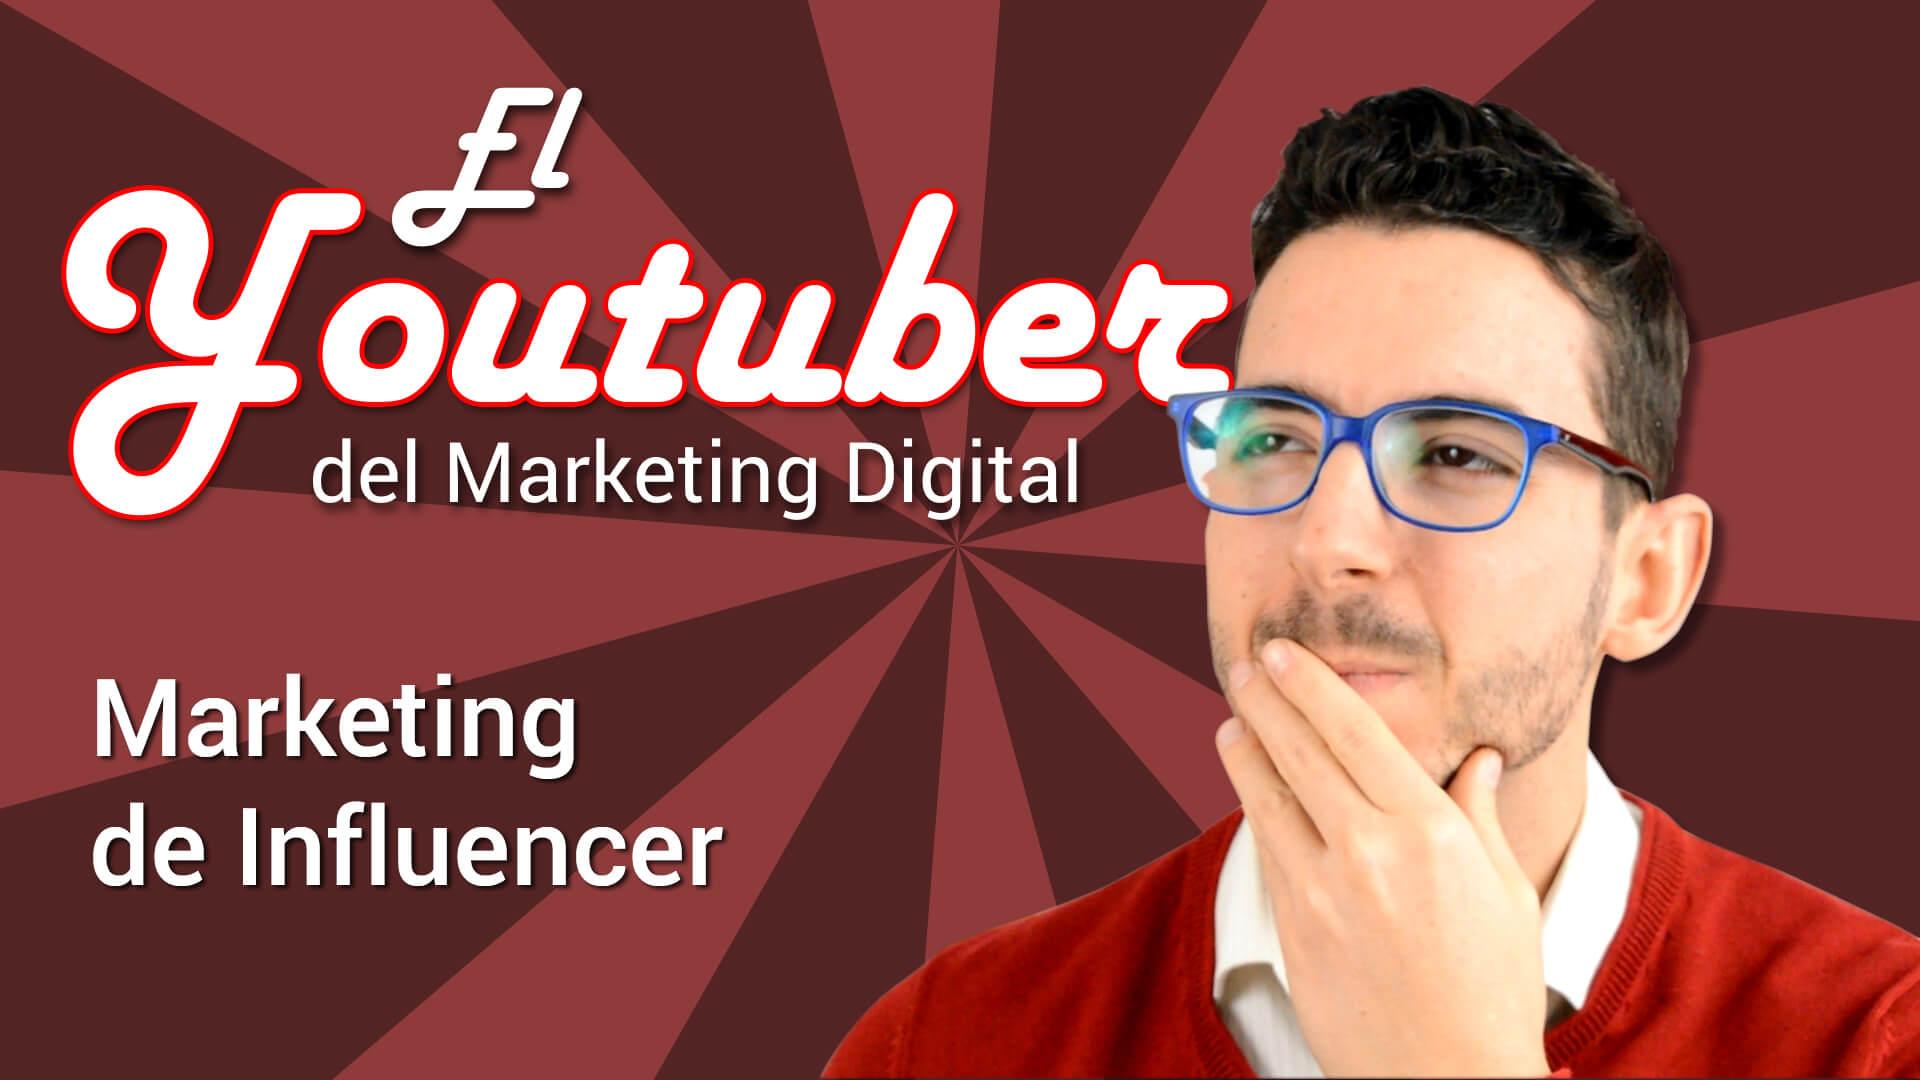 El Youtuber del Marketing Digital: Marketing de Influencer